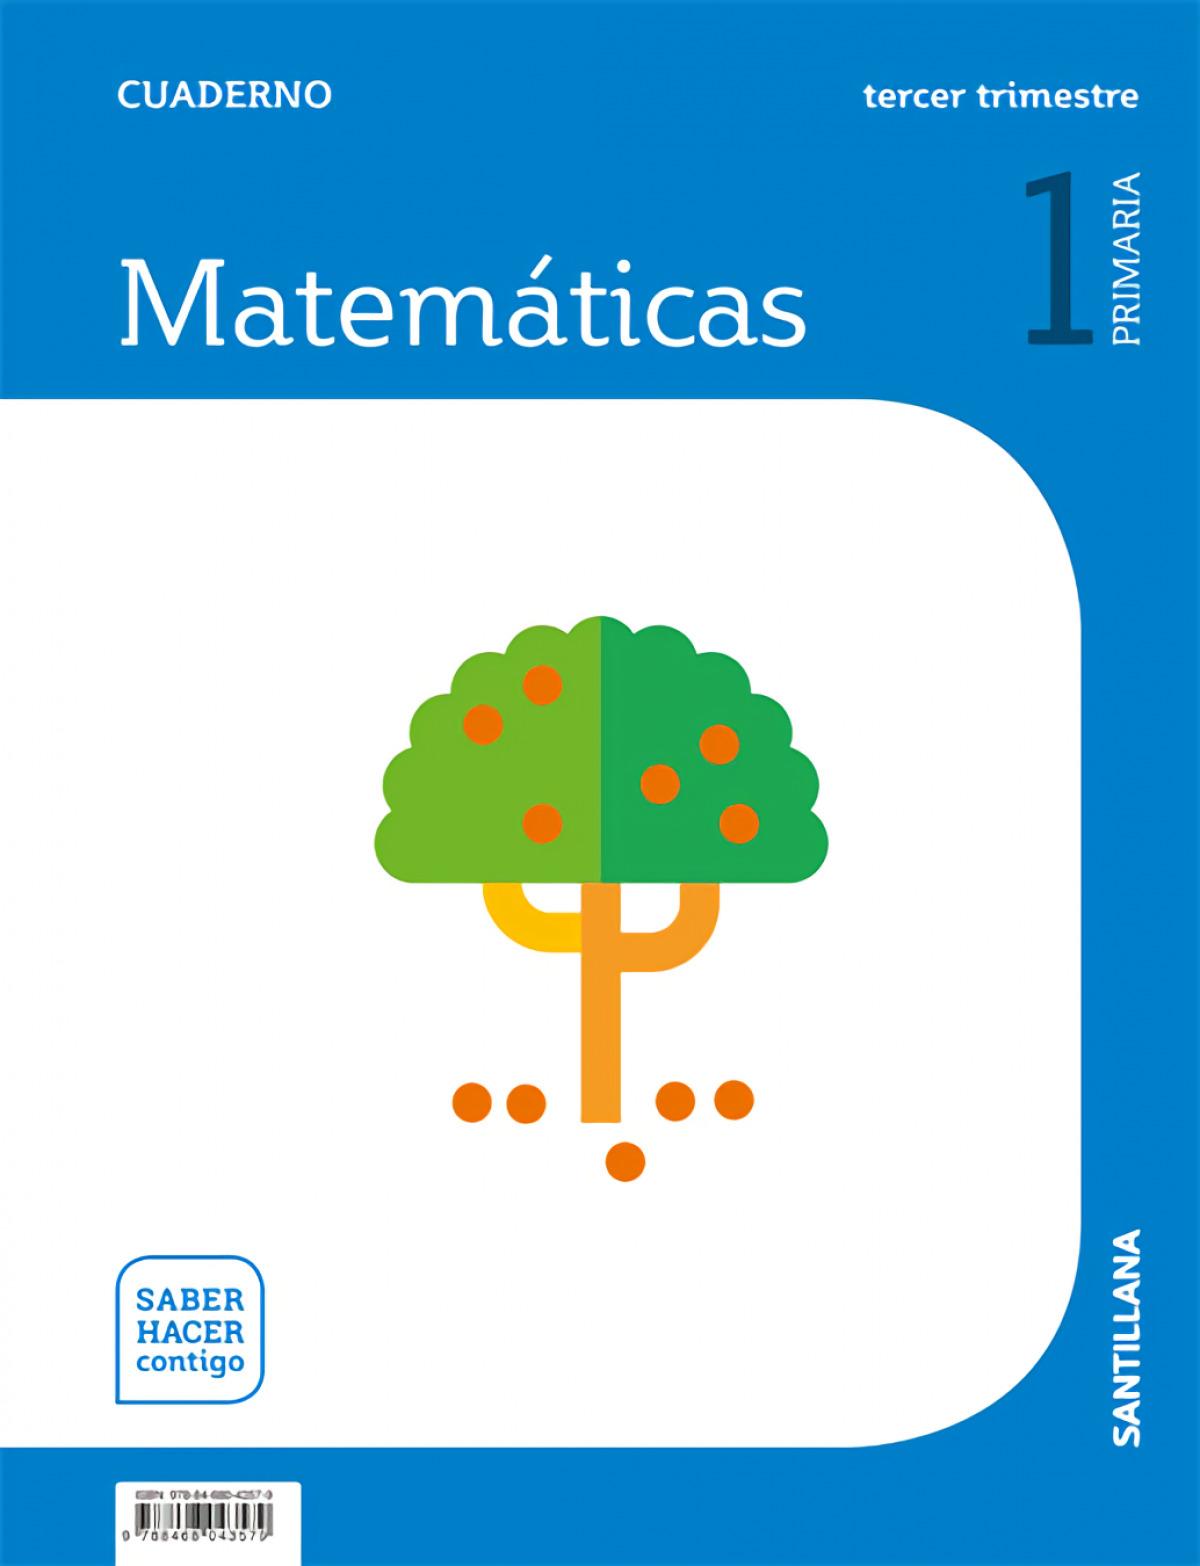 CUADERNO MATEMÁTICAS 3-1o.PRIMARIA. SABER HACER CONTIGO 9788468043579